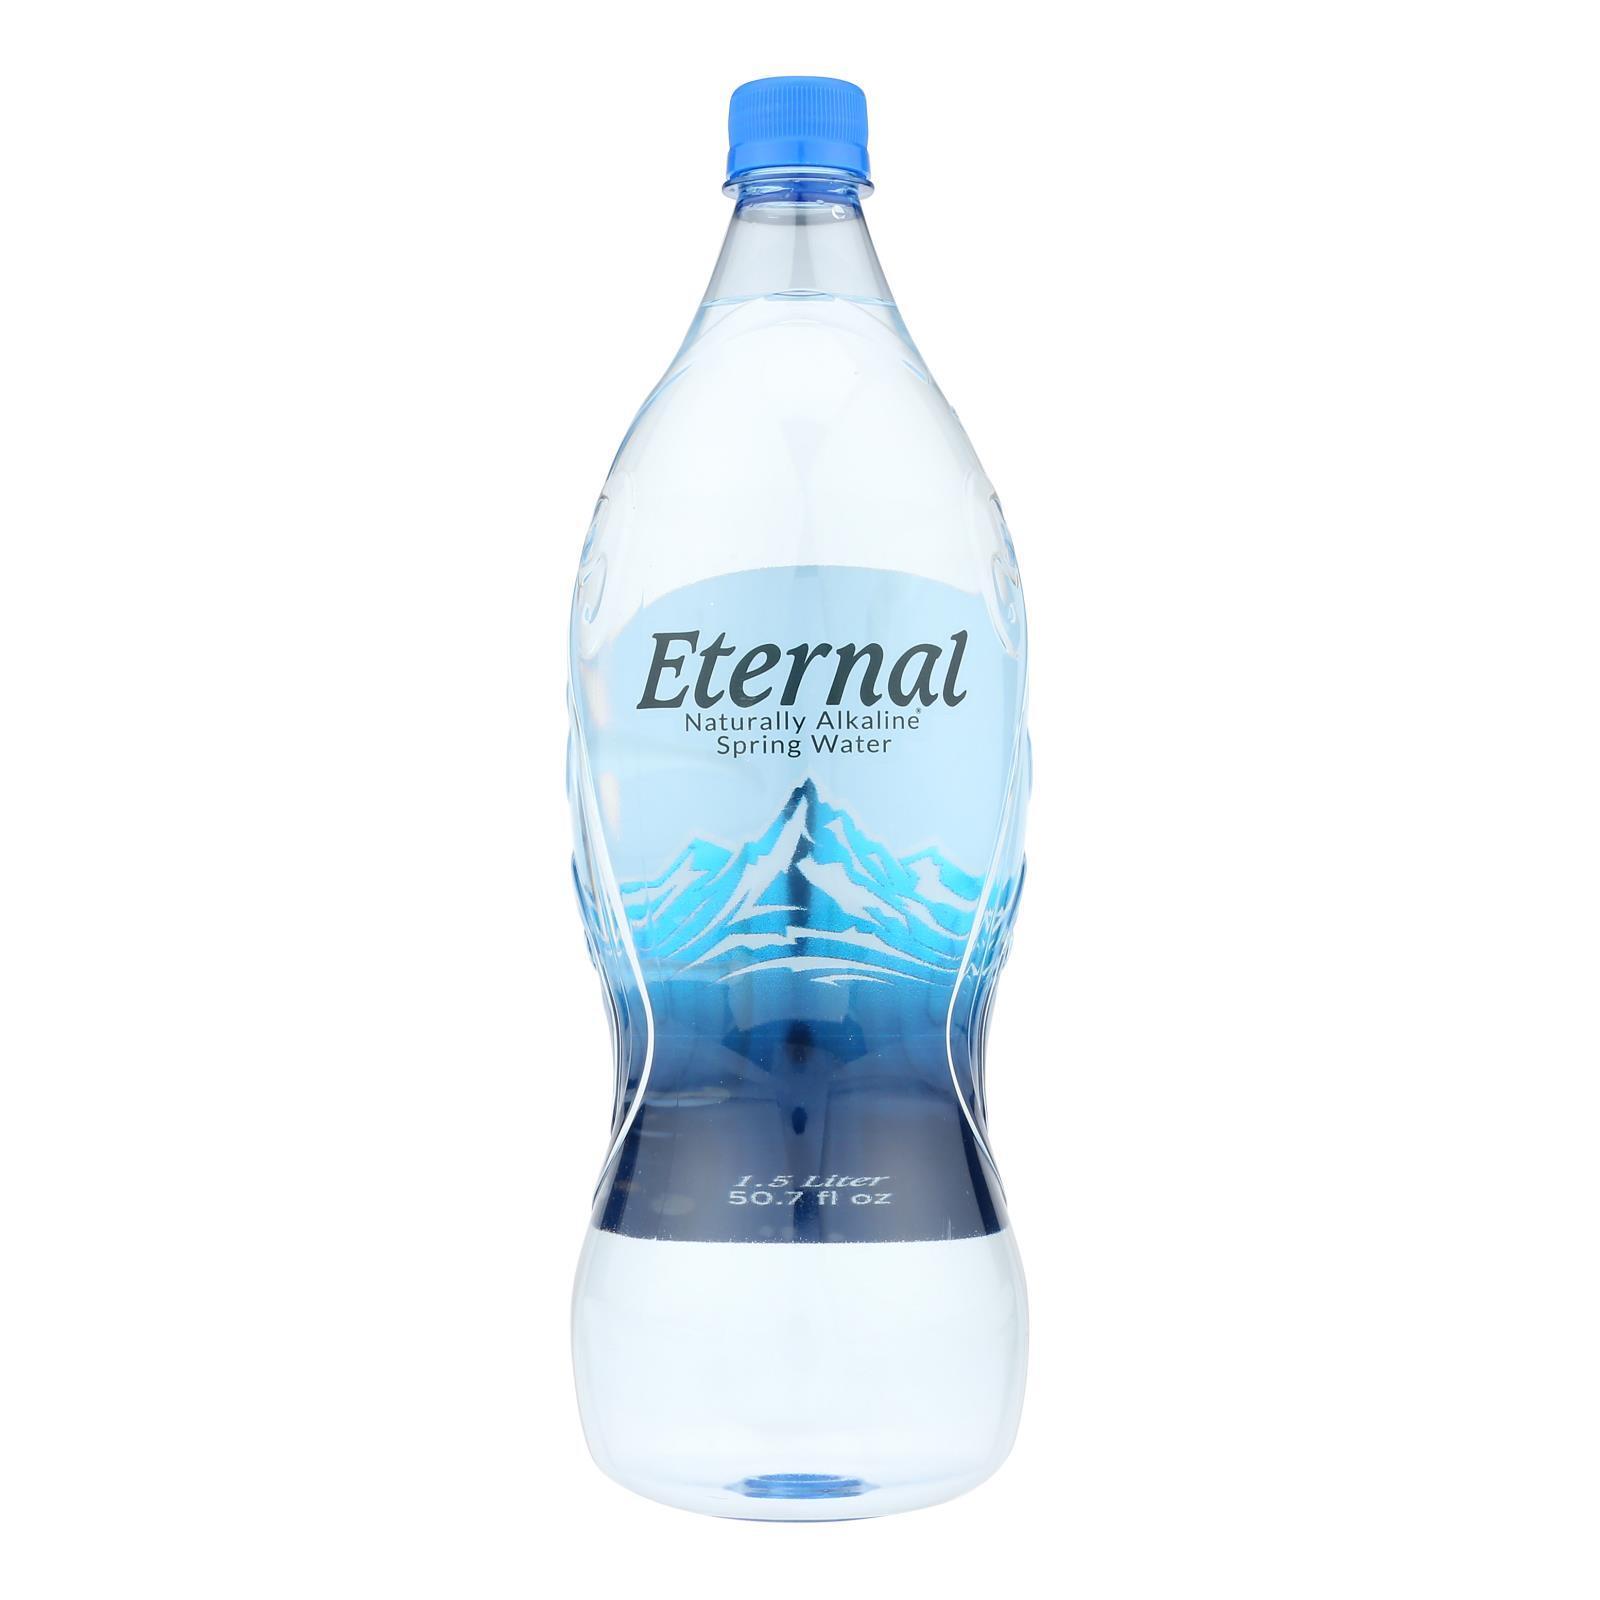 Eternal Naturally Artesion Water - Case of 12 - 1.5 Liter